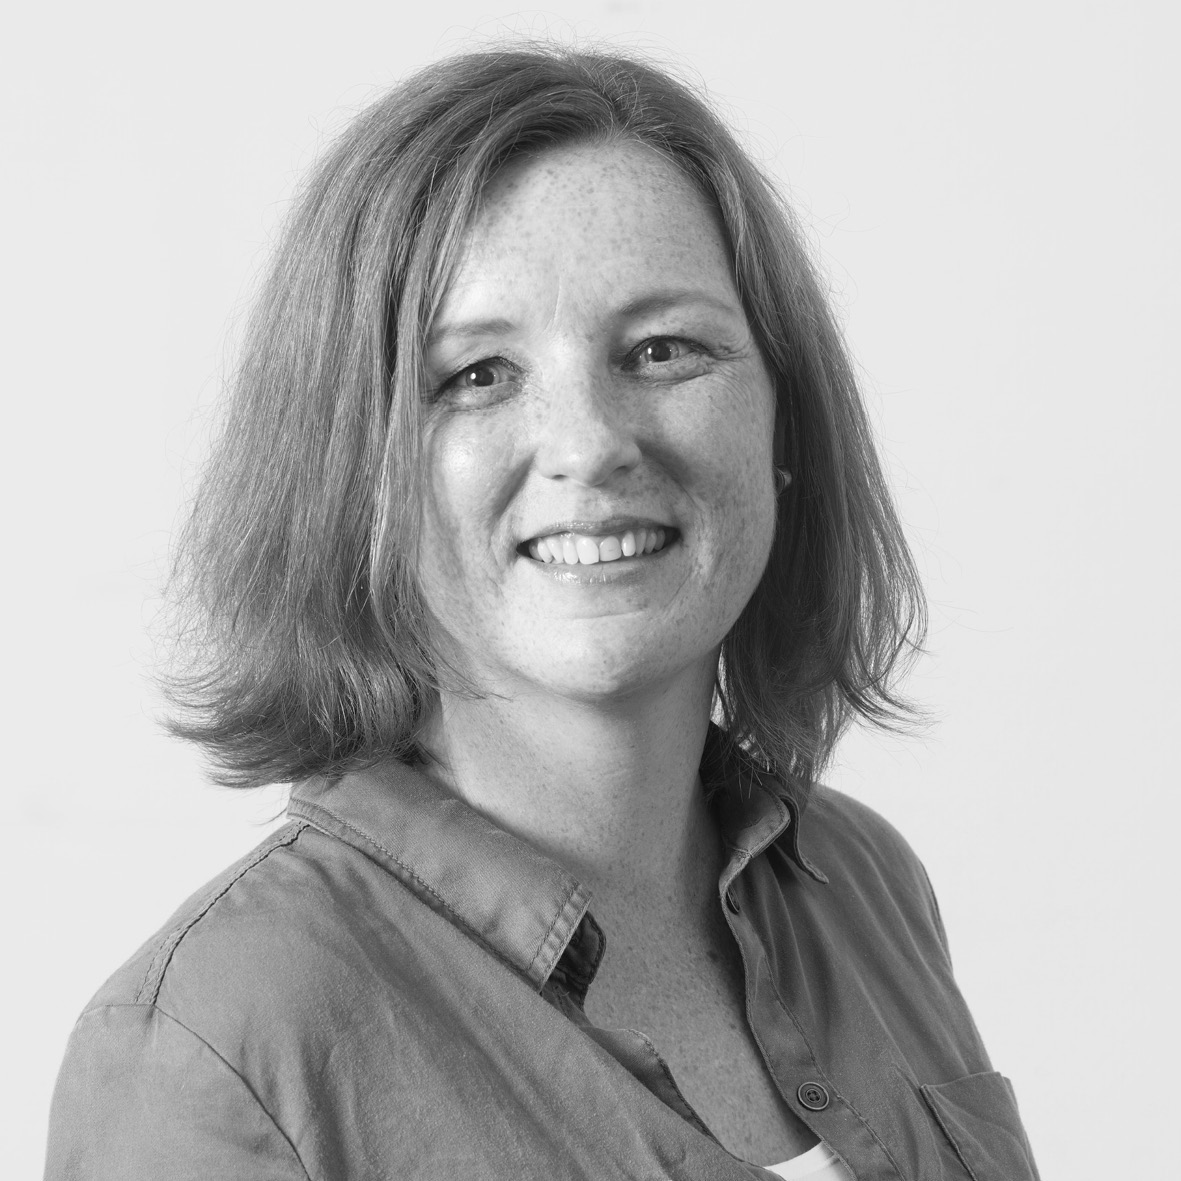 Suzanne de Bakker